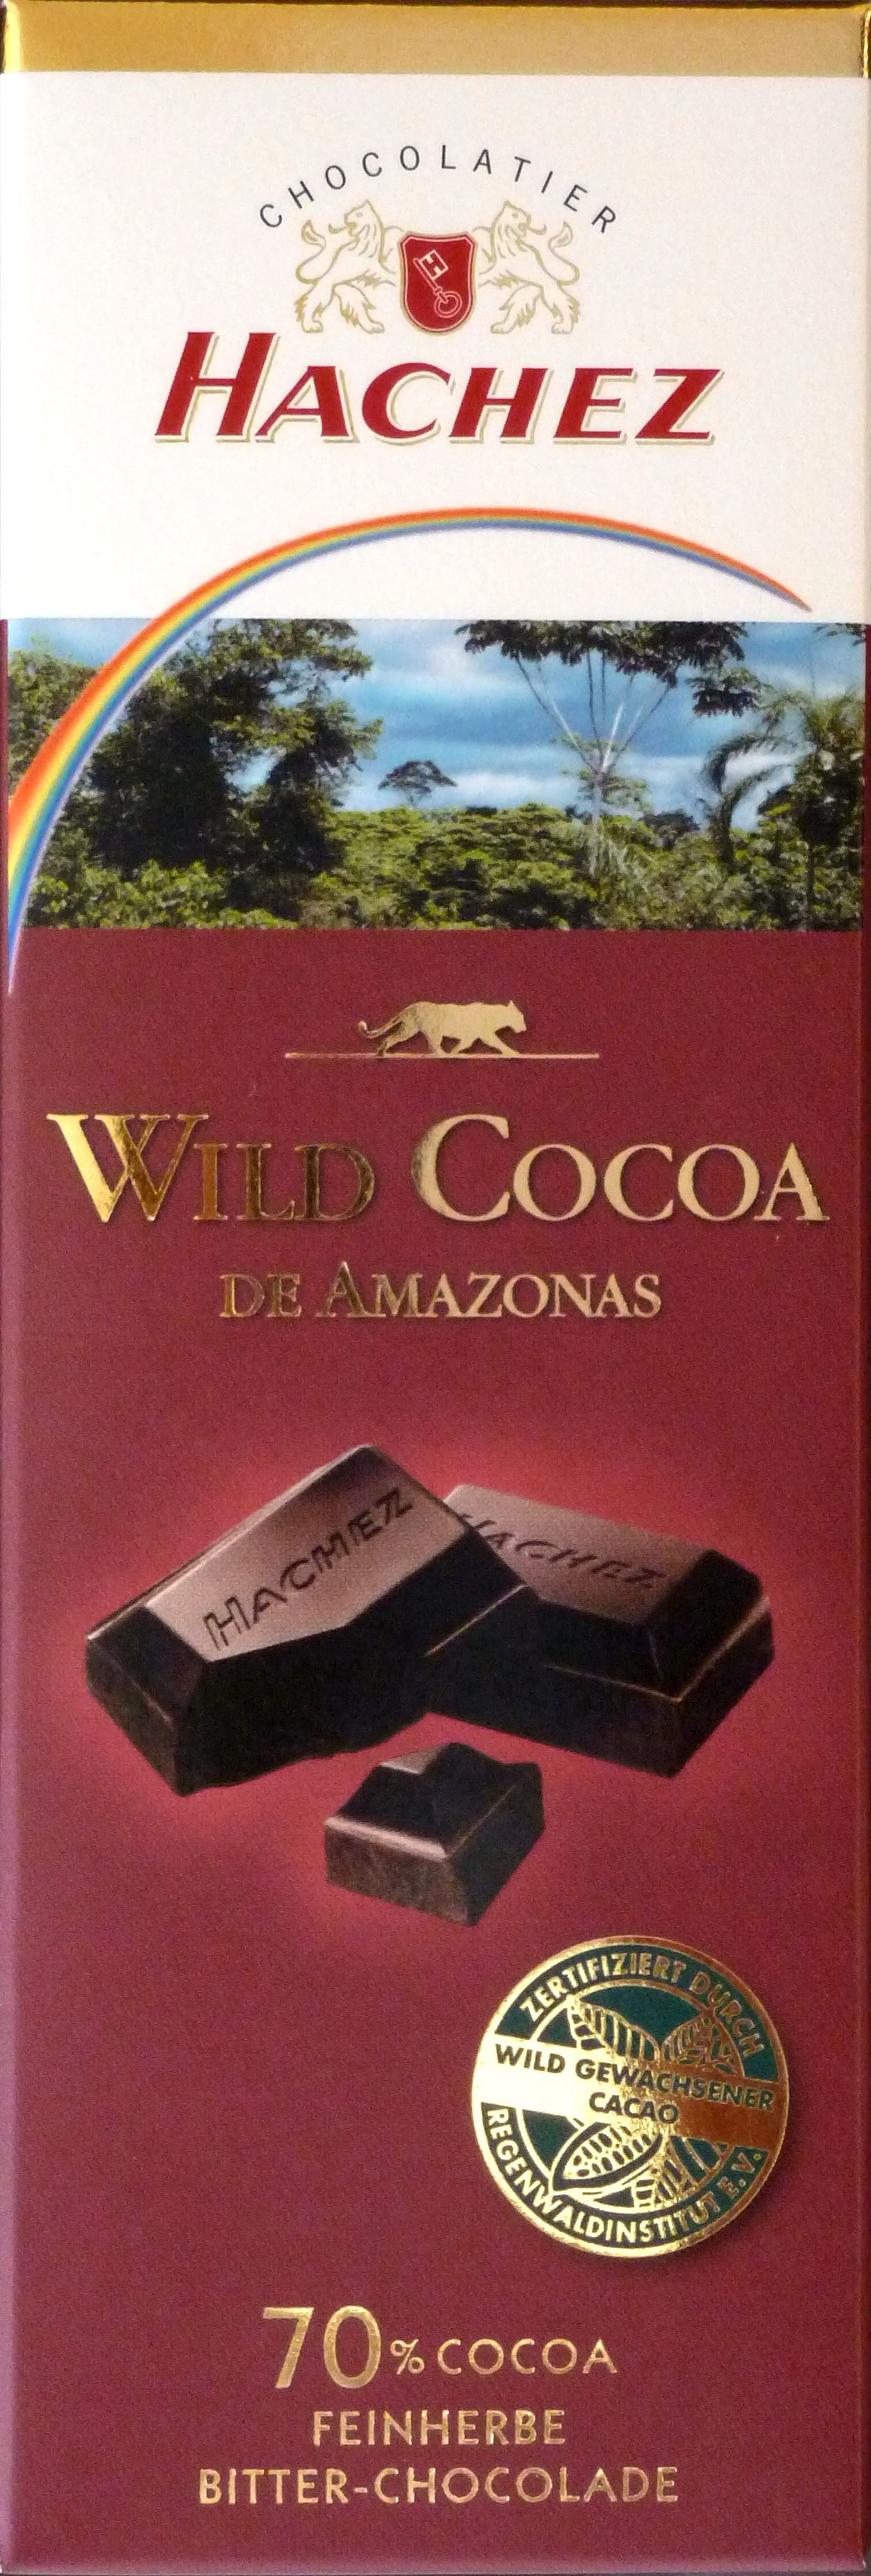 Hachez Wild Cocoa de Amazonas 70%: Vorderansicht